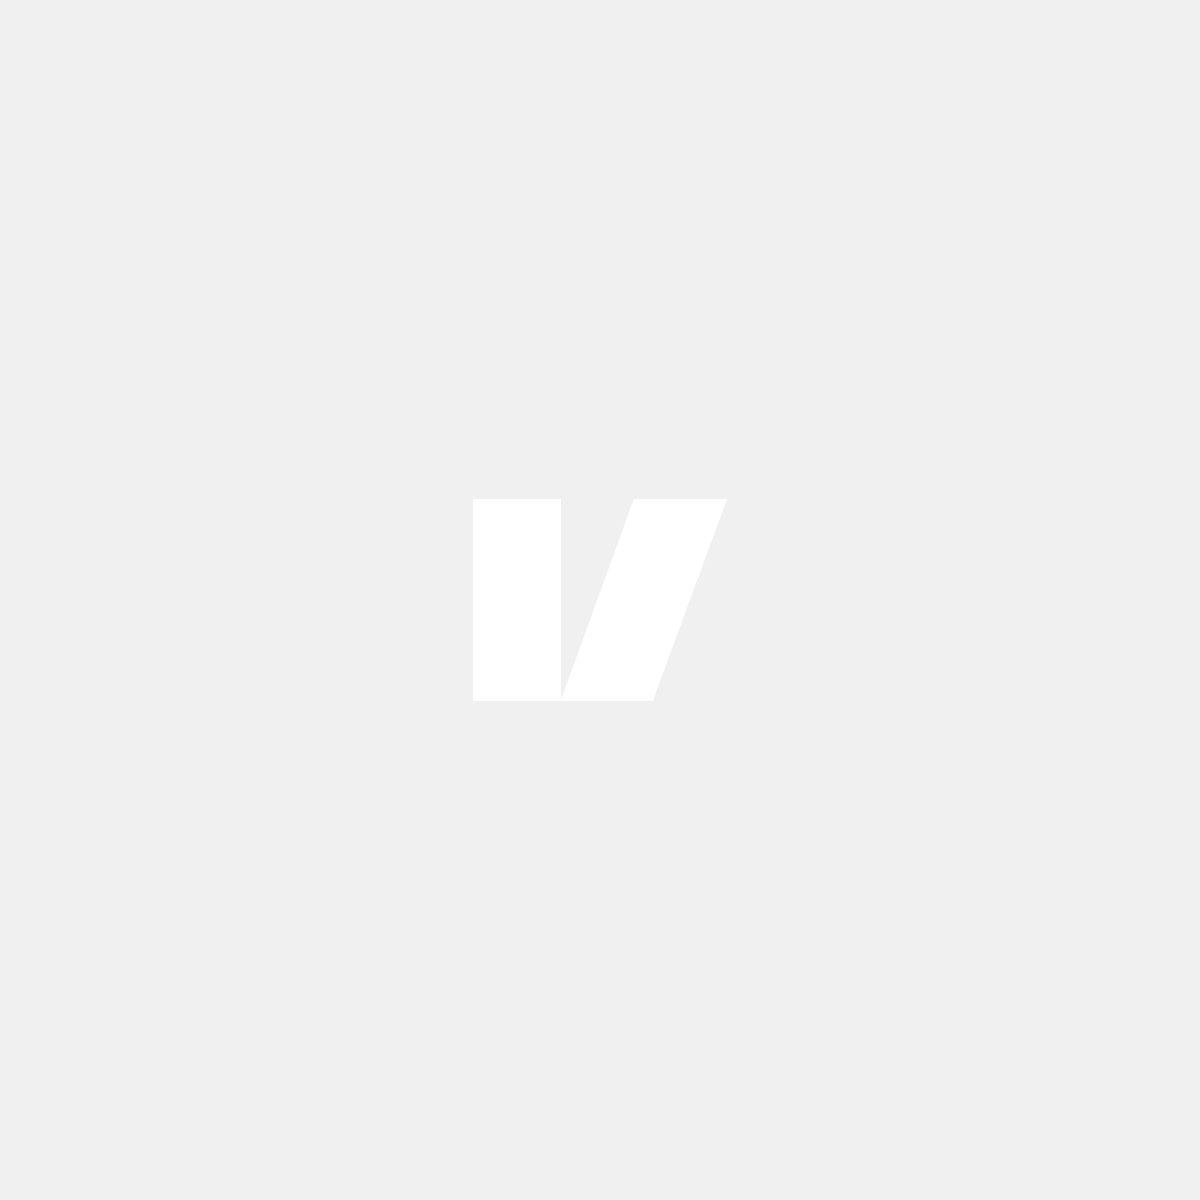 Facelift rear lights V70, XC70 14-